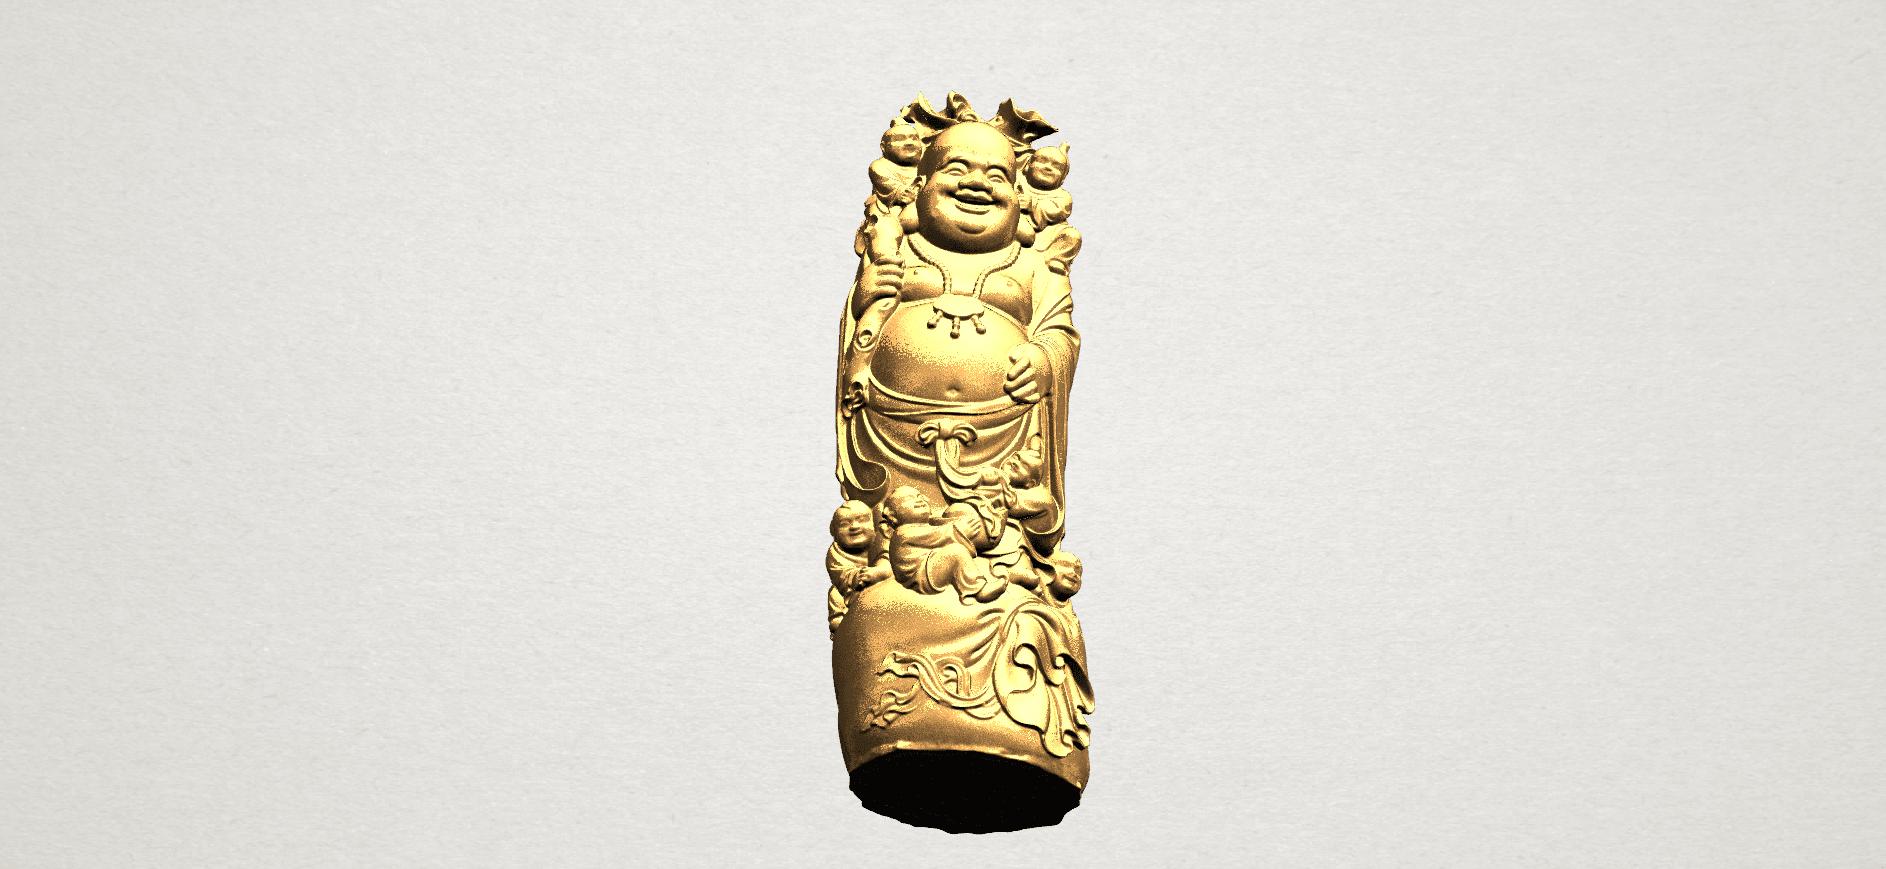 TDA0070 Metteyya Buddha 02 - 88mm - A08.png Download free STL file Metteyya Buddha 02 • 3D printer object, GeorgesNikkei